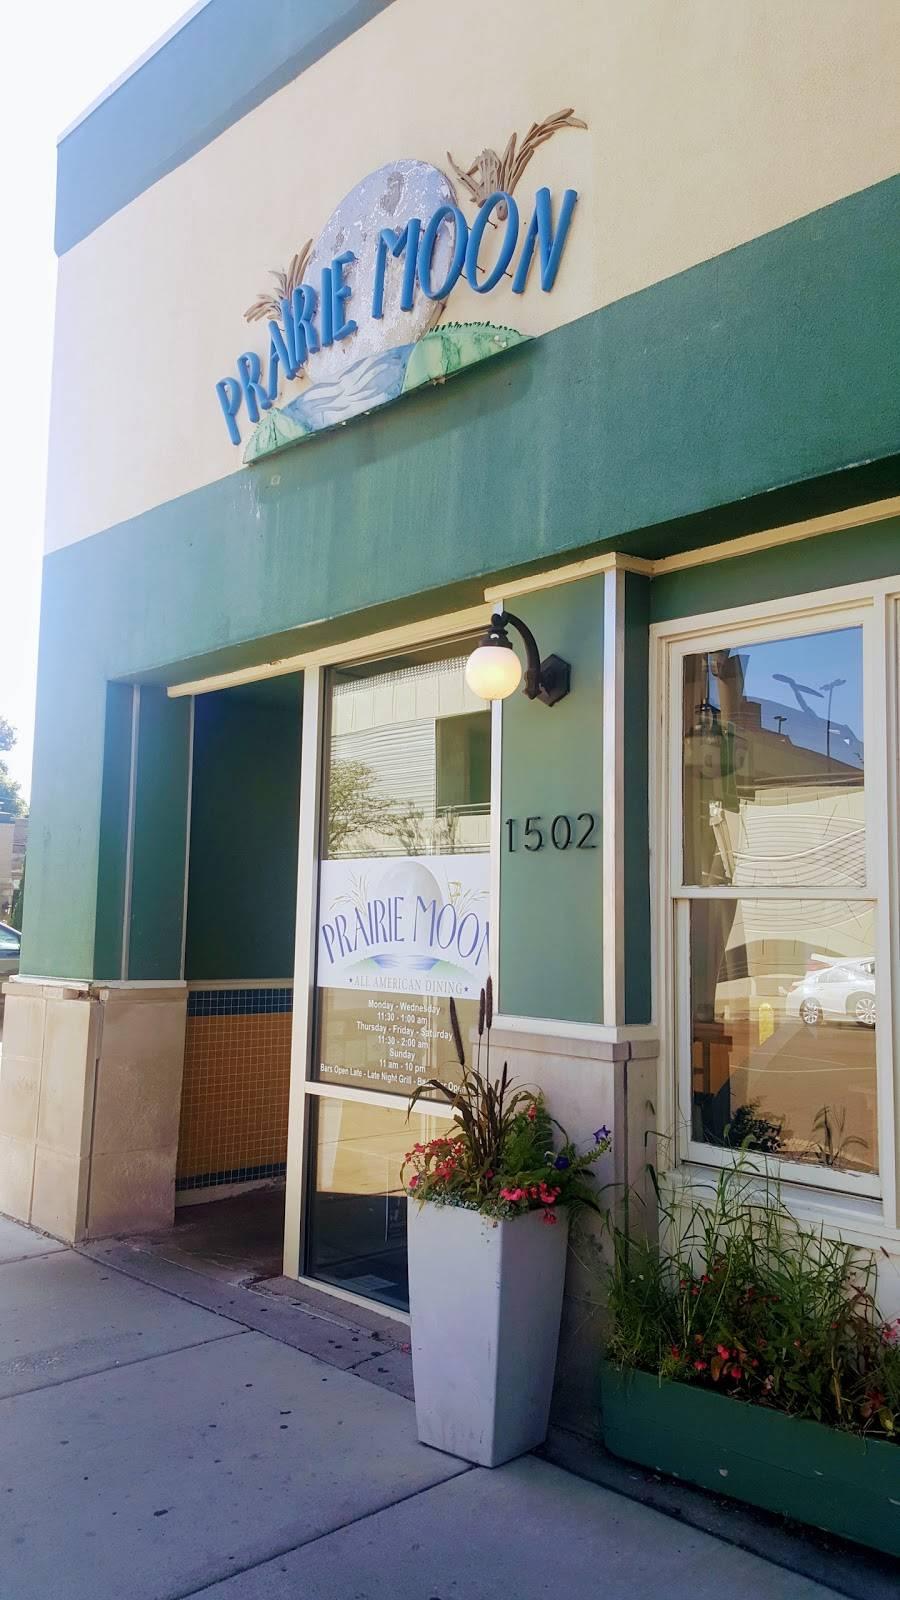 Prairie Moon   restaurant   4407, 1635 Chicago Ave, Evanston, IL 60201, USA   8478648328 OR +1 847-864-8328